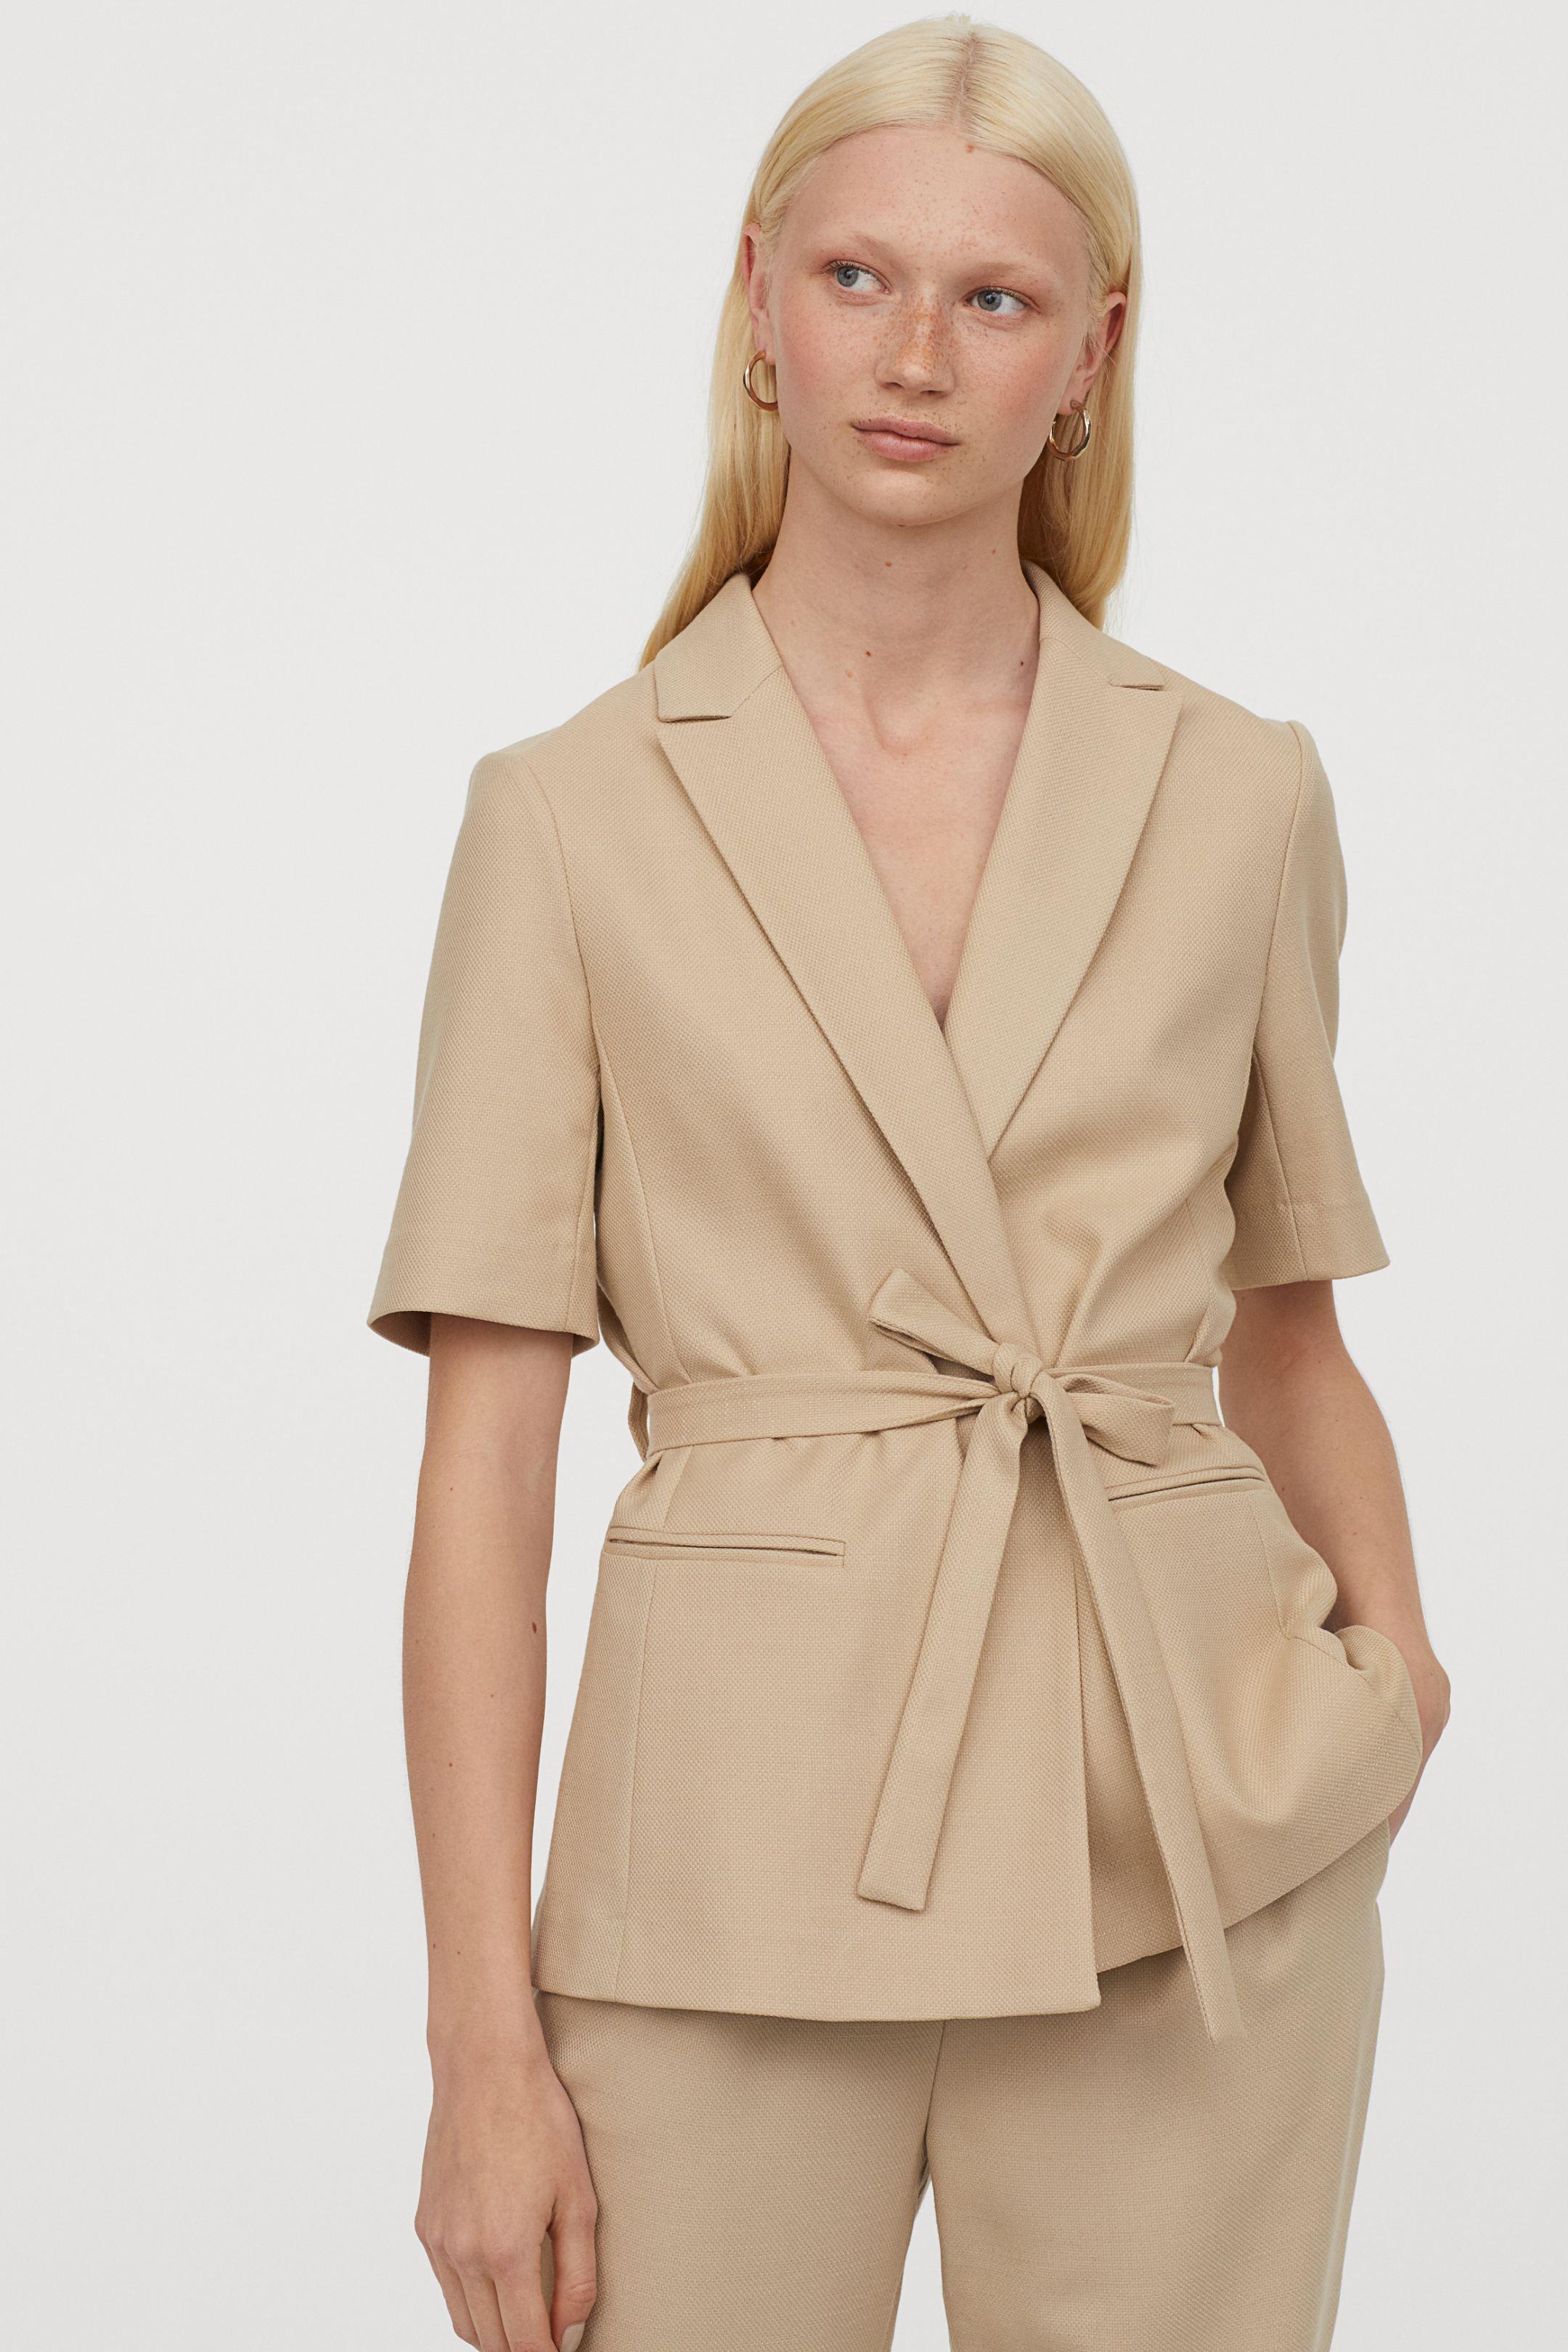 H&M short sleeve blazer